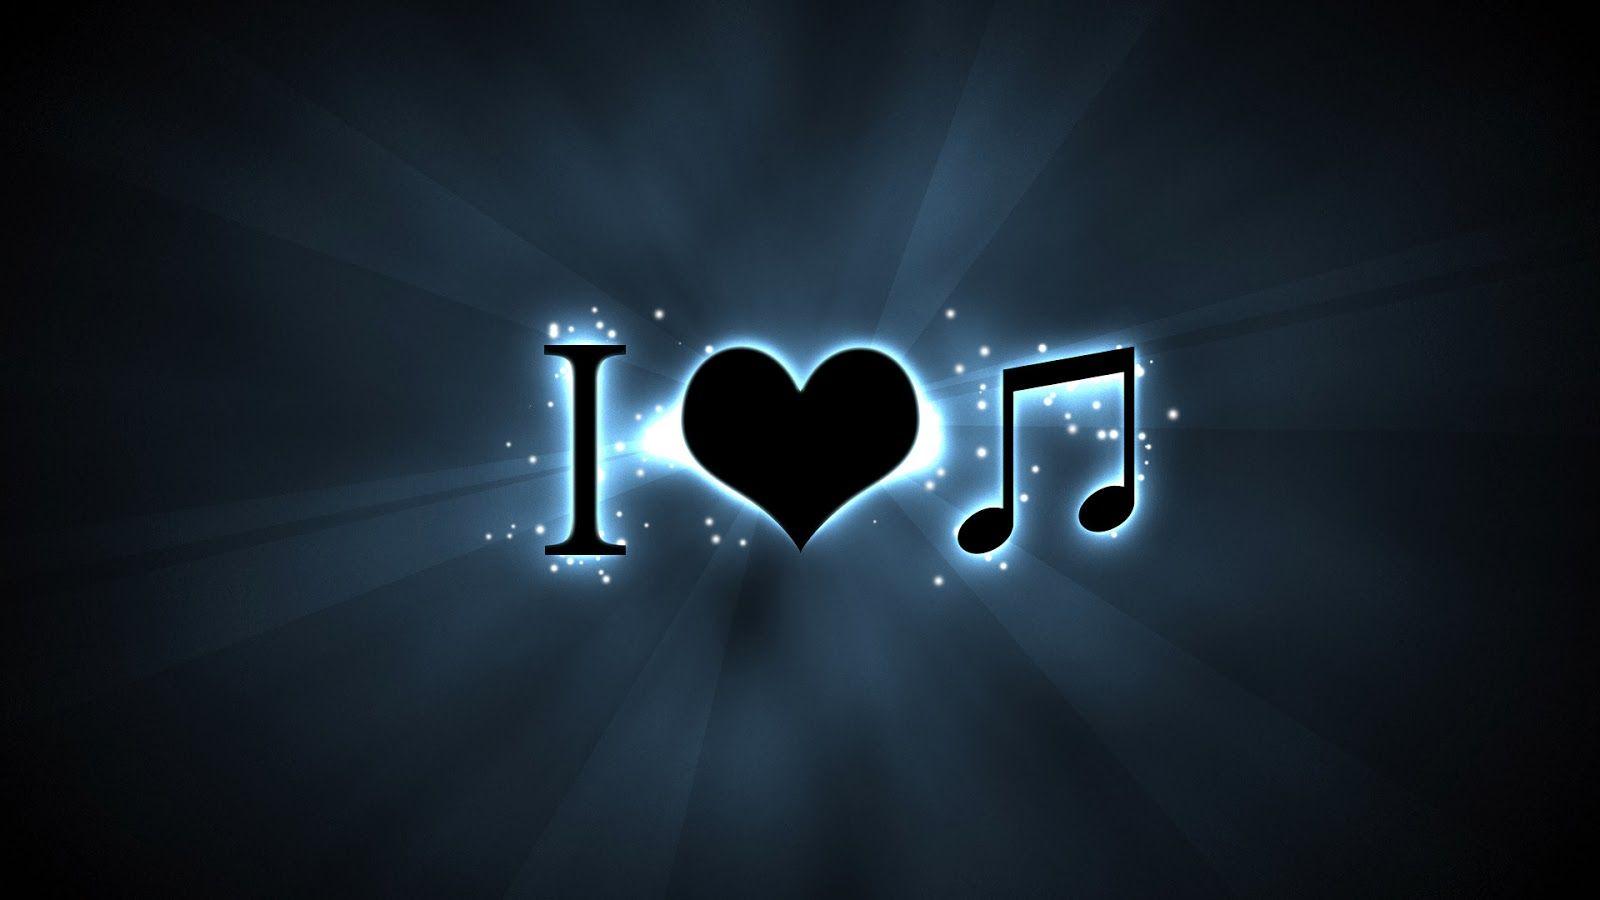 Neon Music Wallpapers Desktop Music Wallpapers Neon Music Music Wallpaper